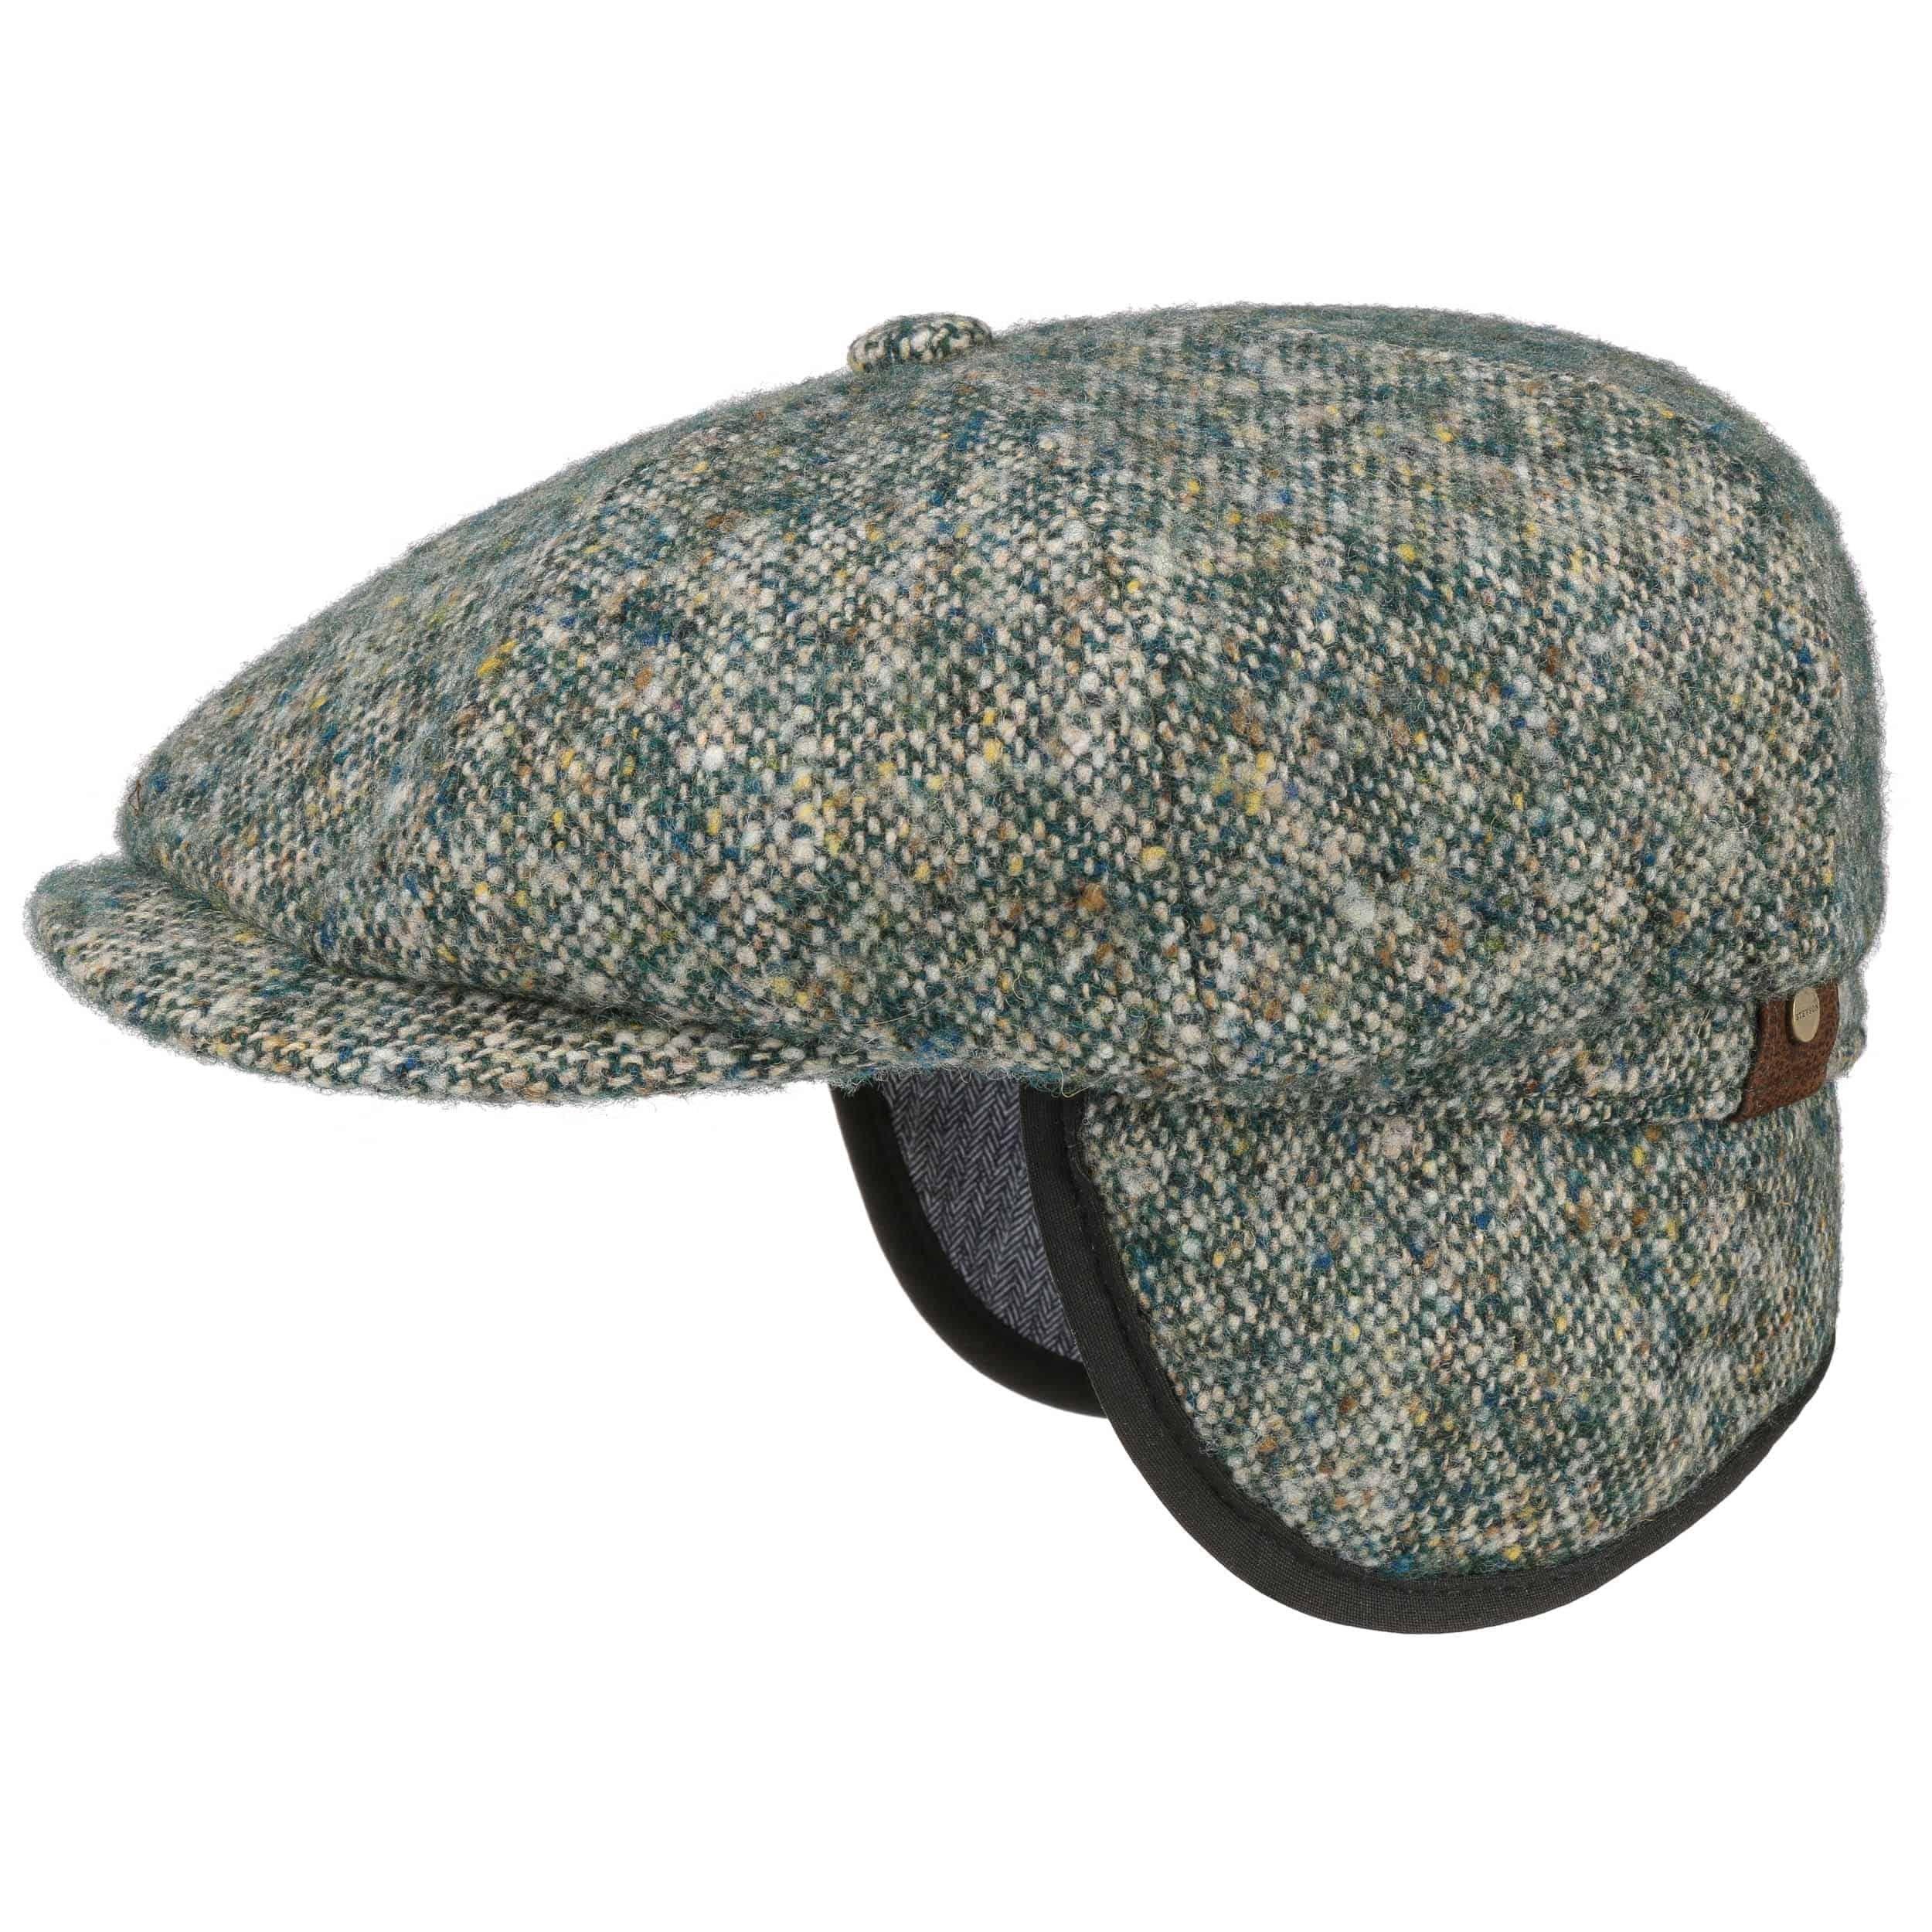 Hatteras Donegal Earflaps Cap grün